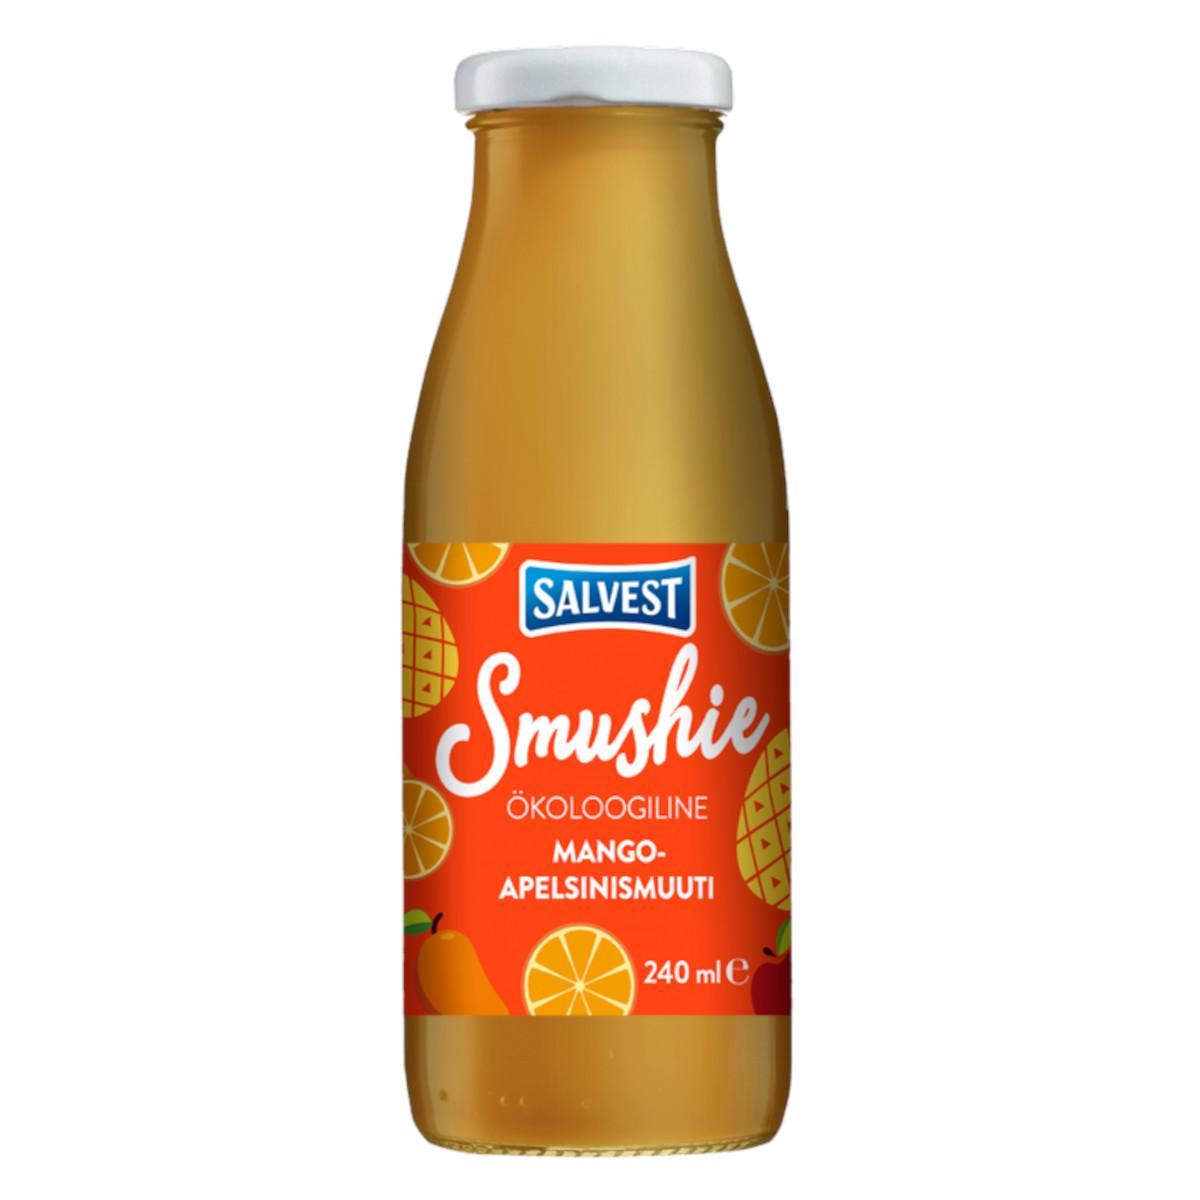 Salvest Smushie BIO Ovocné smoothie s mangem, ananasem a pomerančovou dužinou 240 ml